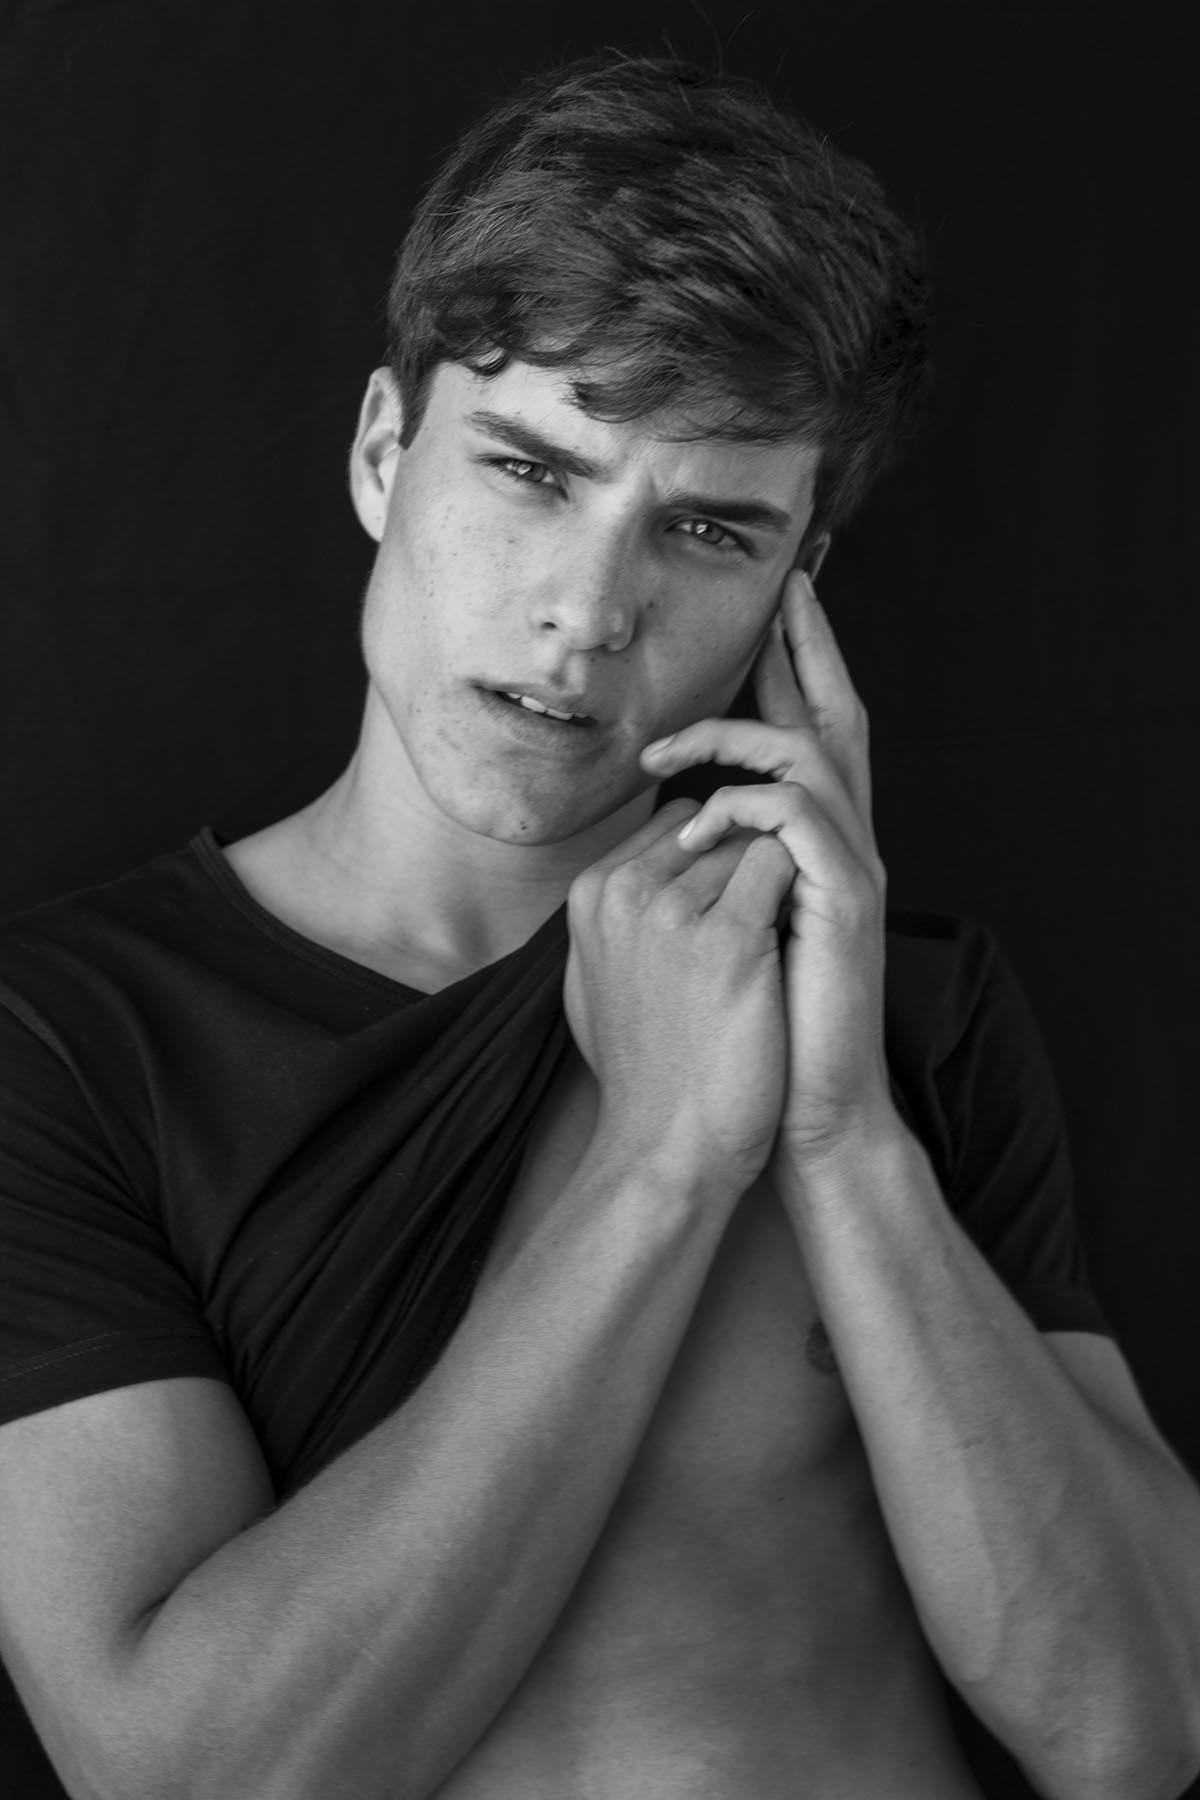 Pedro Maia by Gilson de Rezendeh for Brazilian Male Model